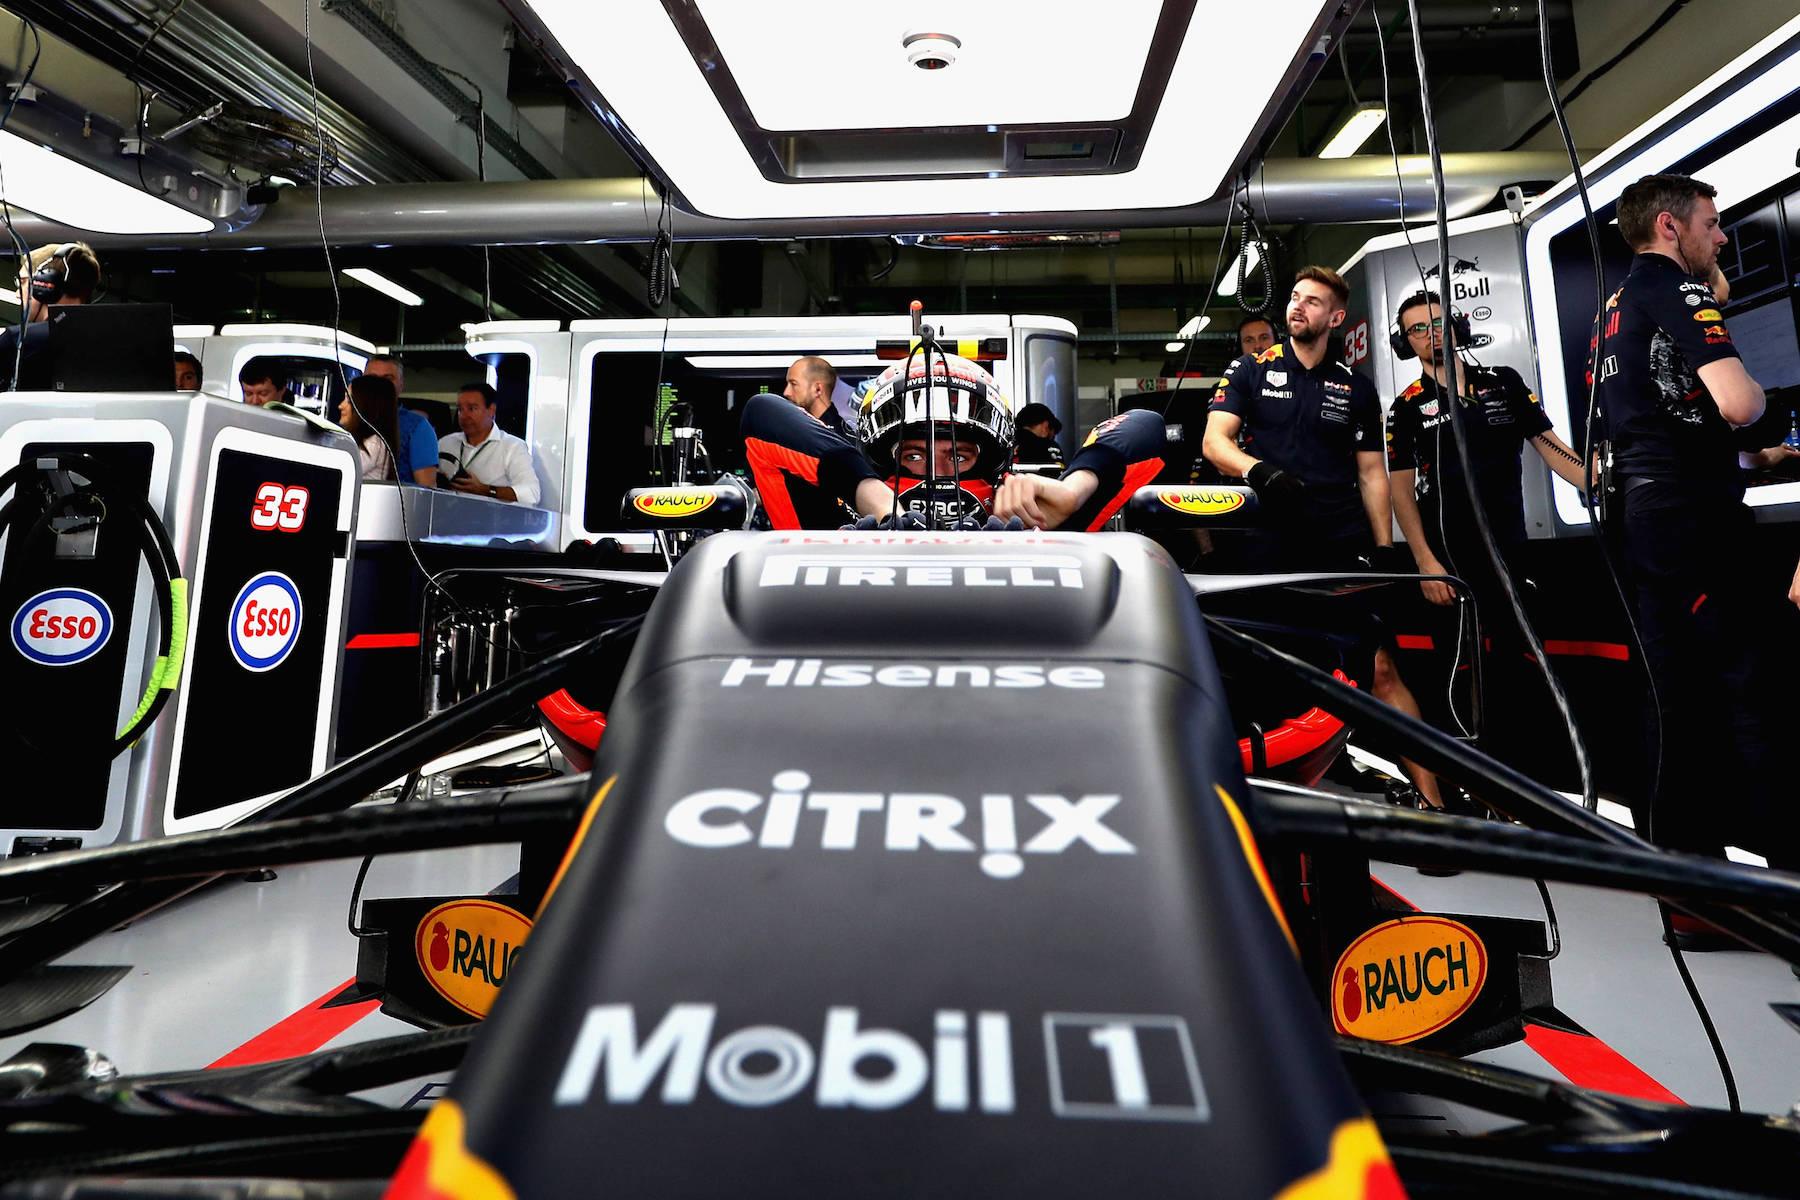 2017 Max Verstappen | Red Bull RB13 | 2017 Russian GP Q1 1 copy.jpg